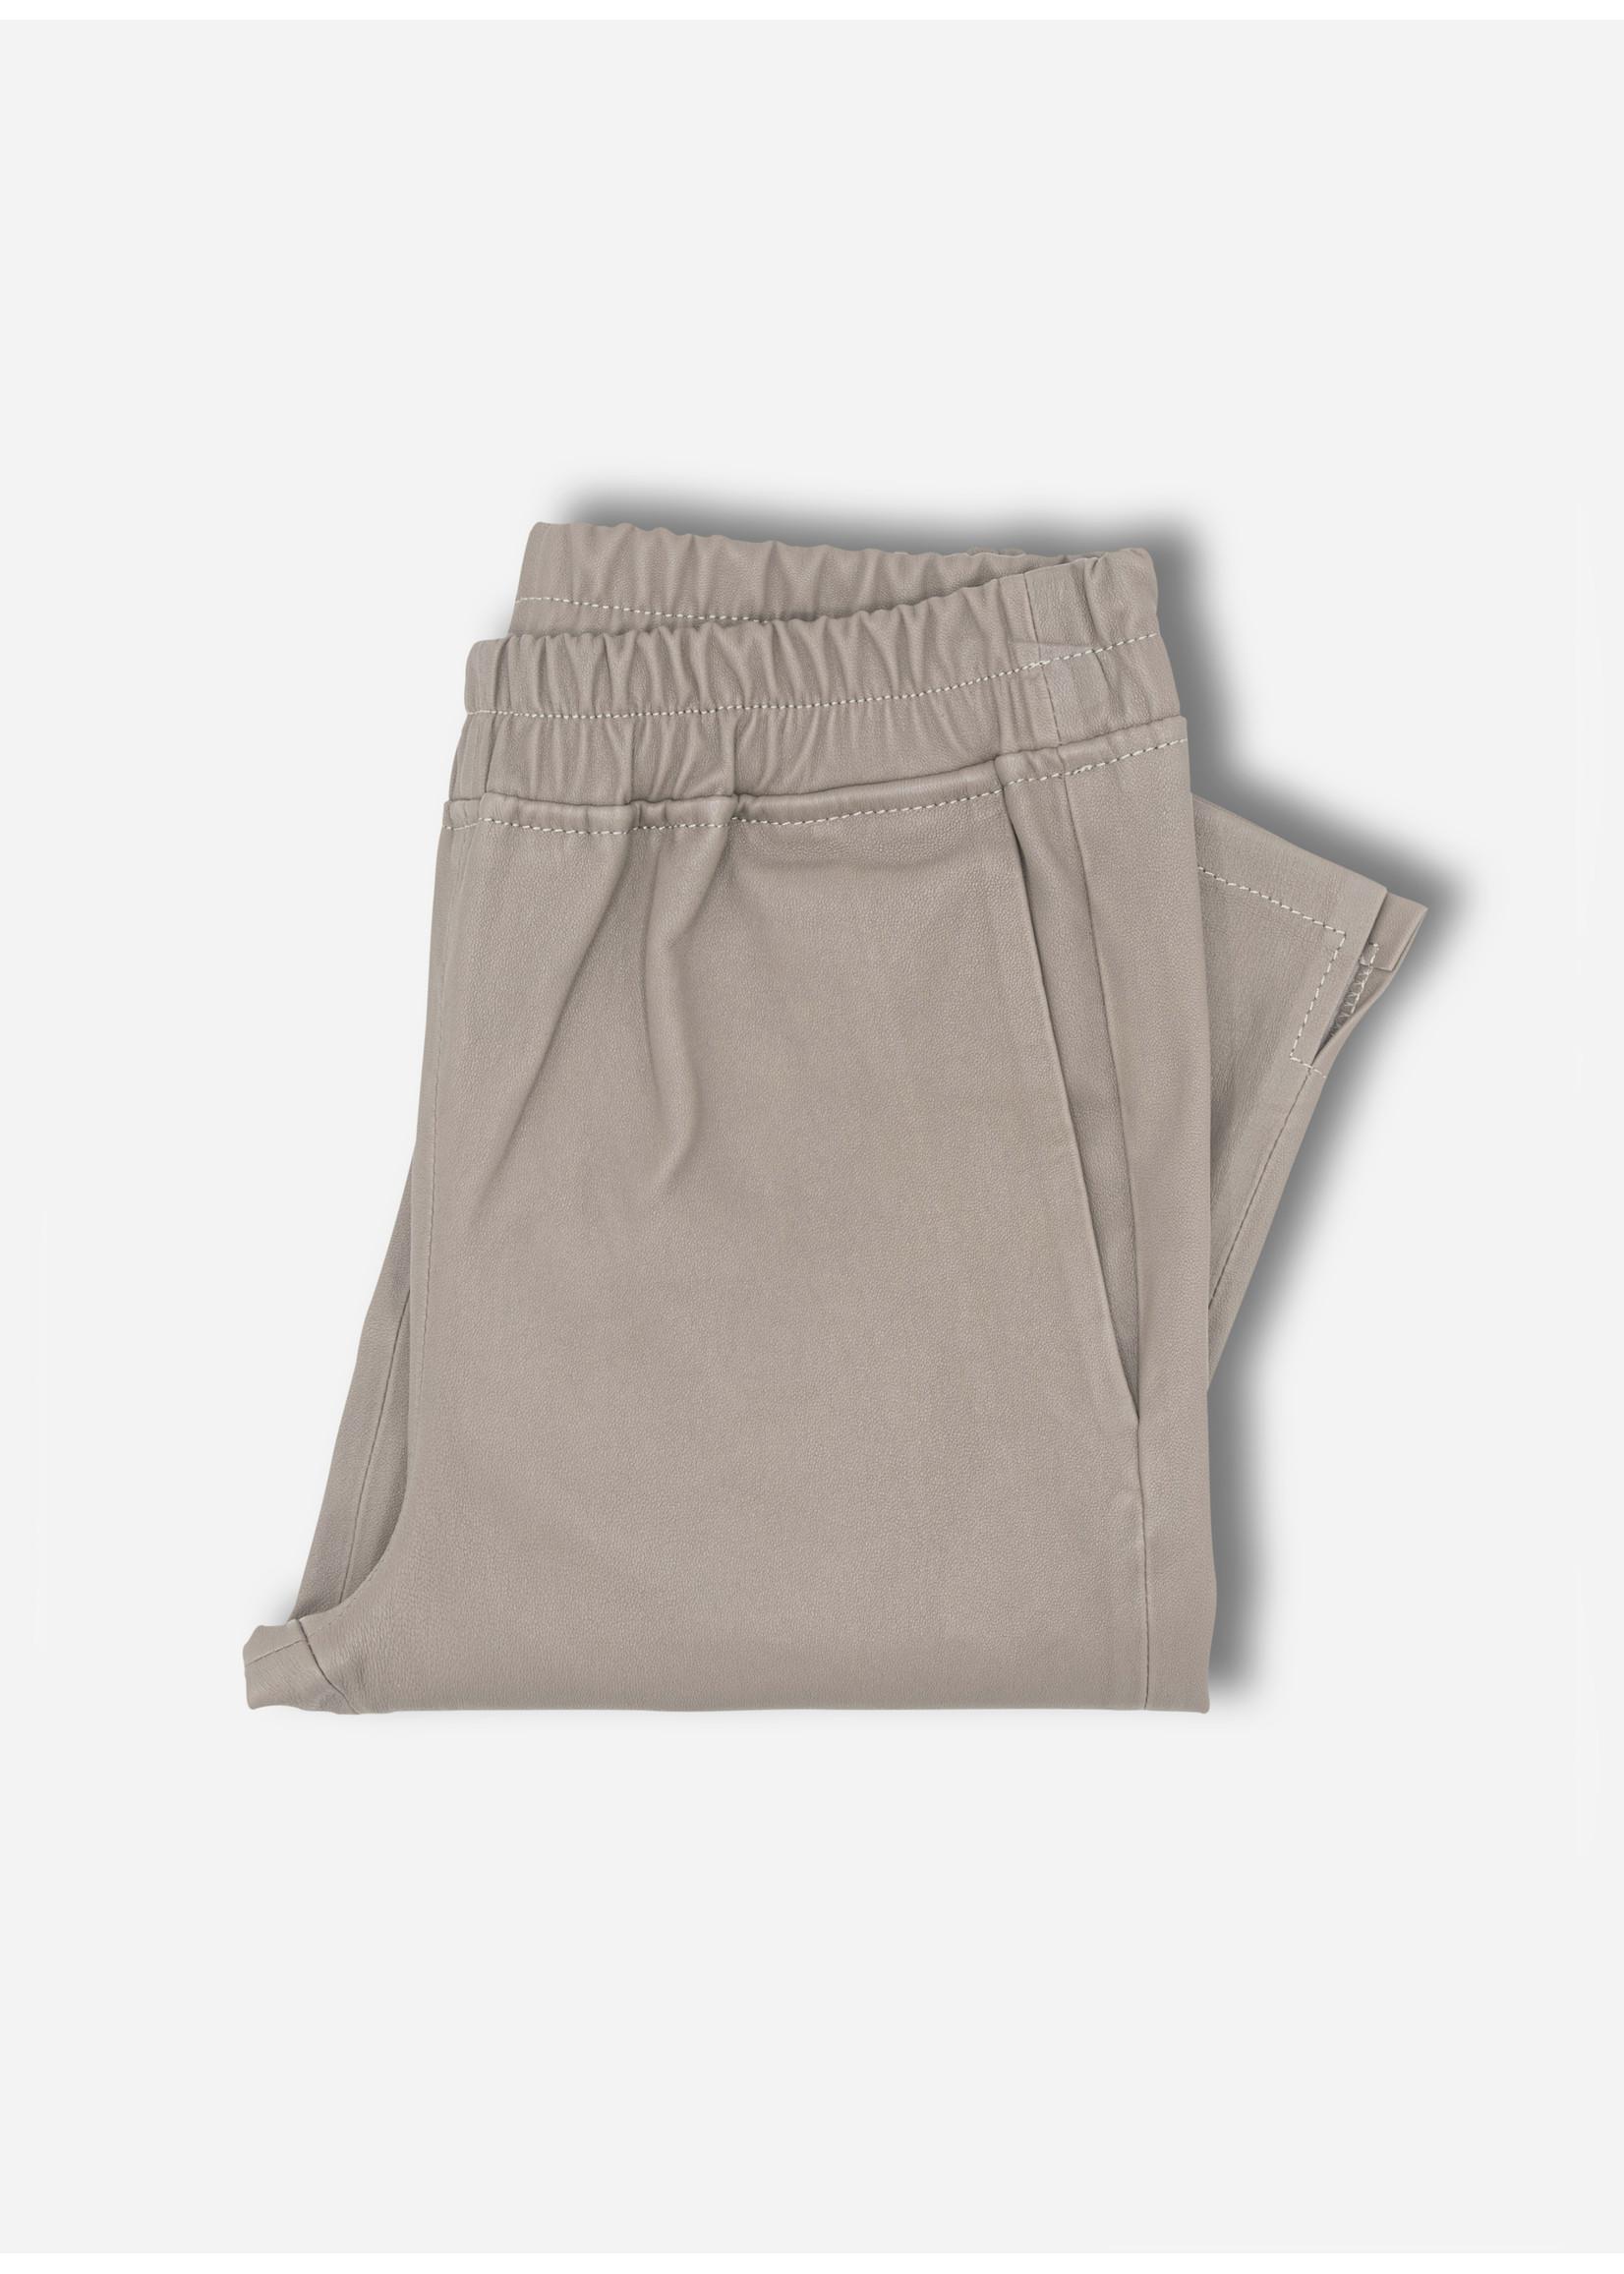 Arma Chatou stretch plonge grey taupe